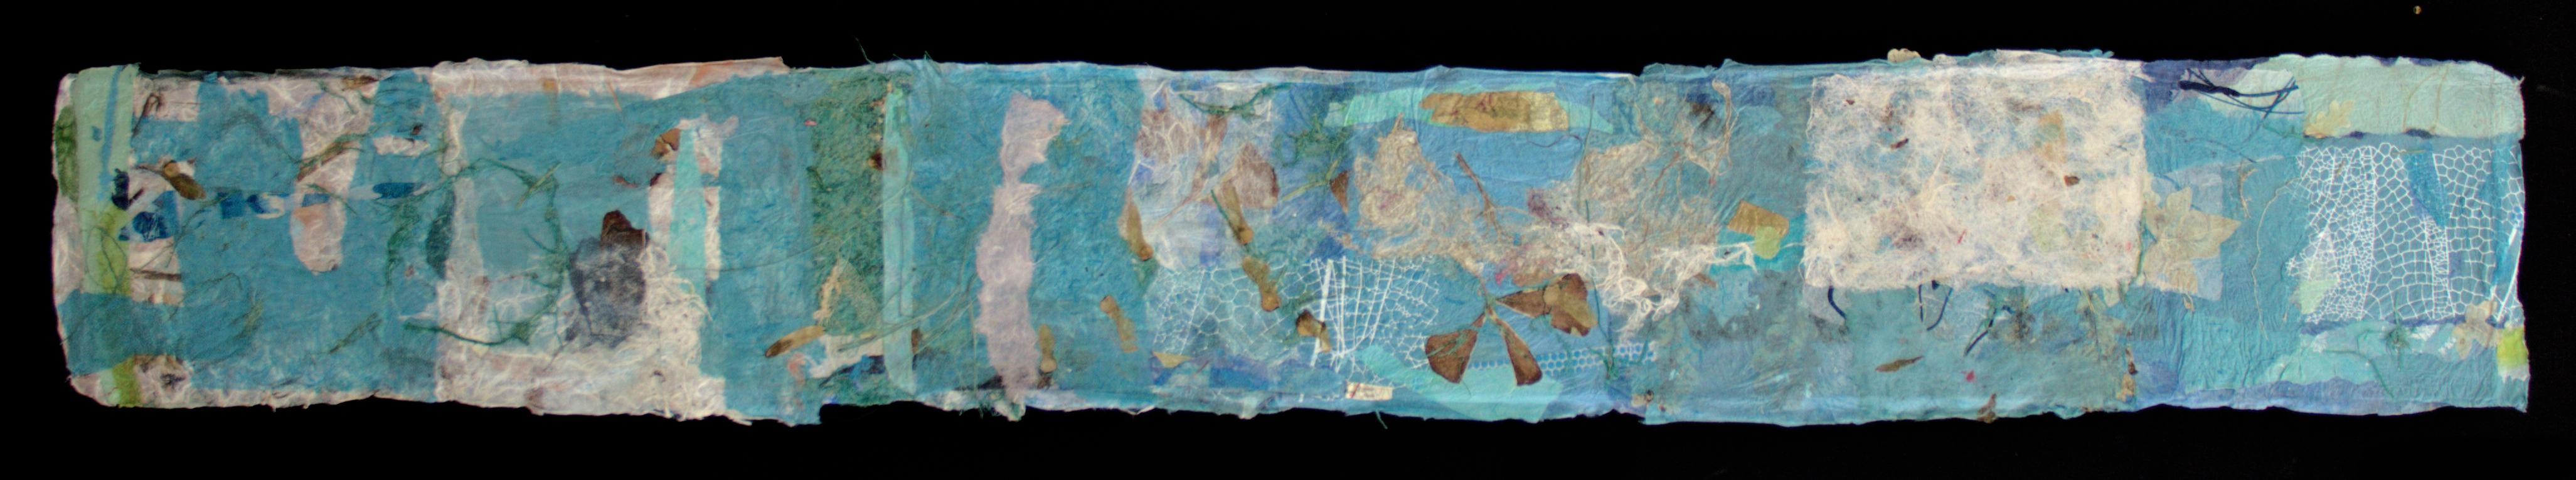 Landschaftserzähler L IV 140x17